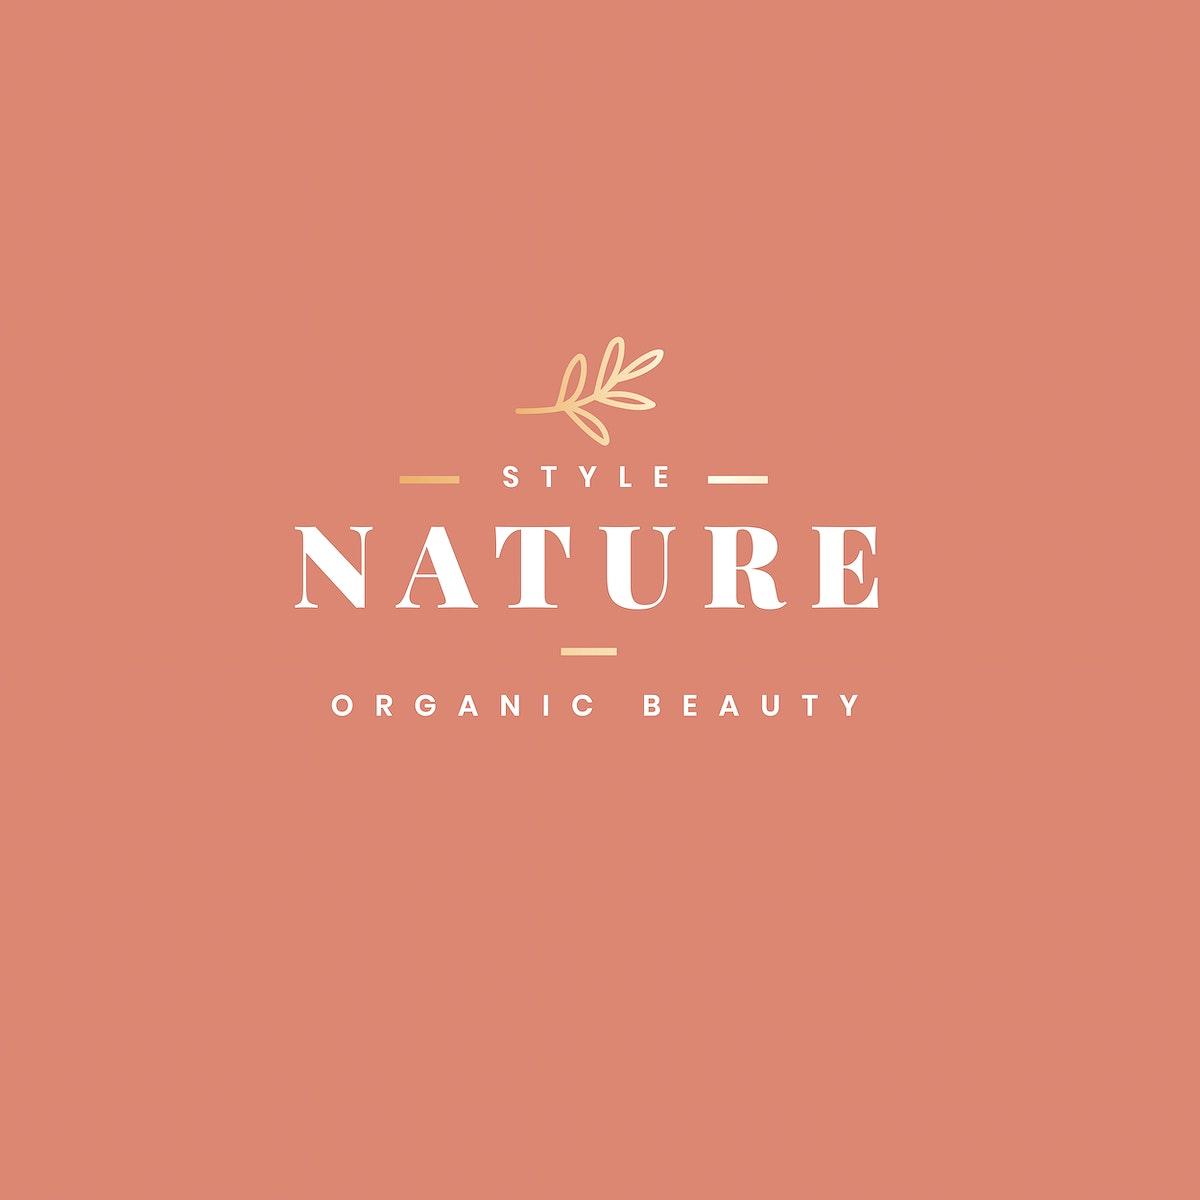 Organic beauty product logo design vector